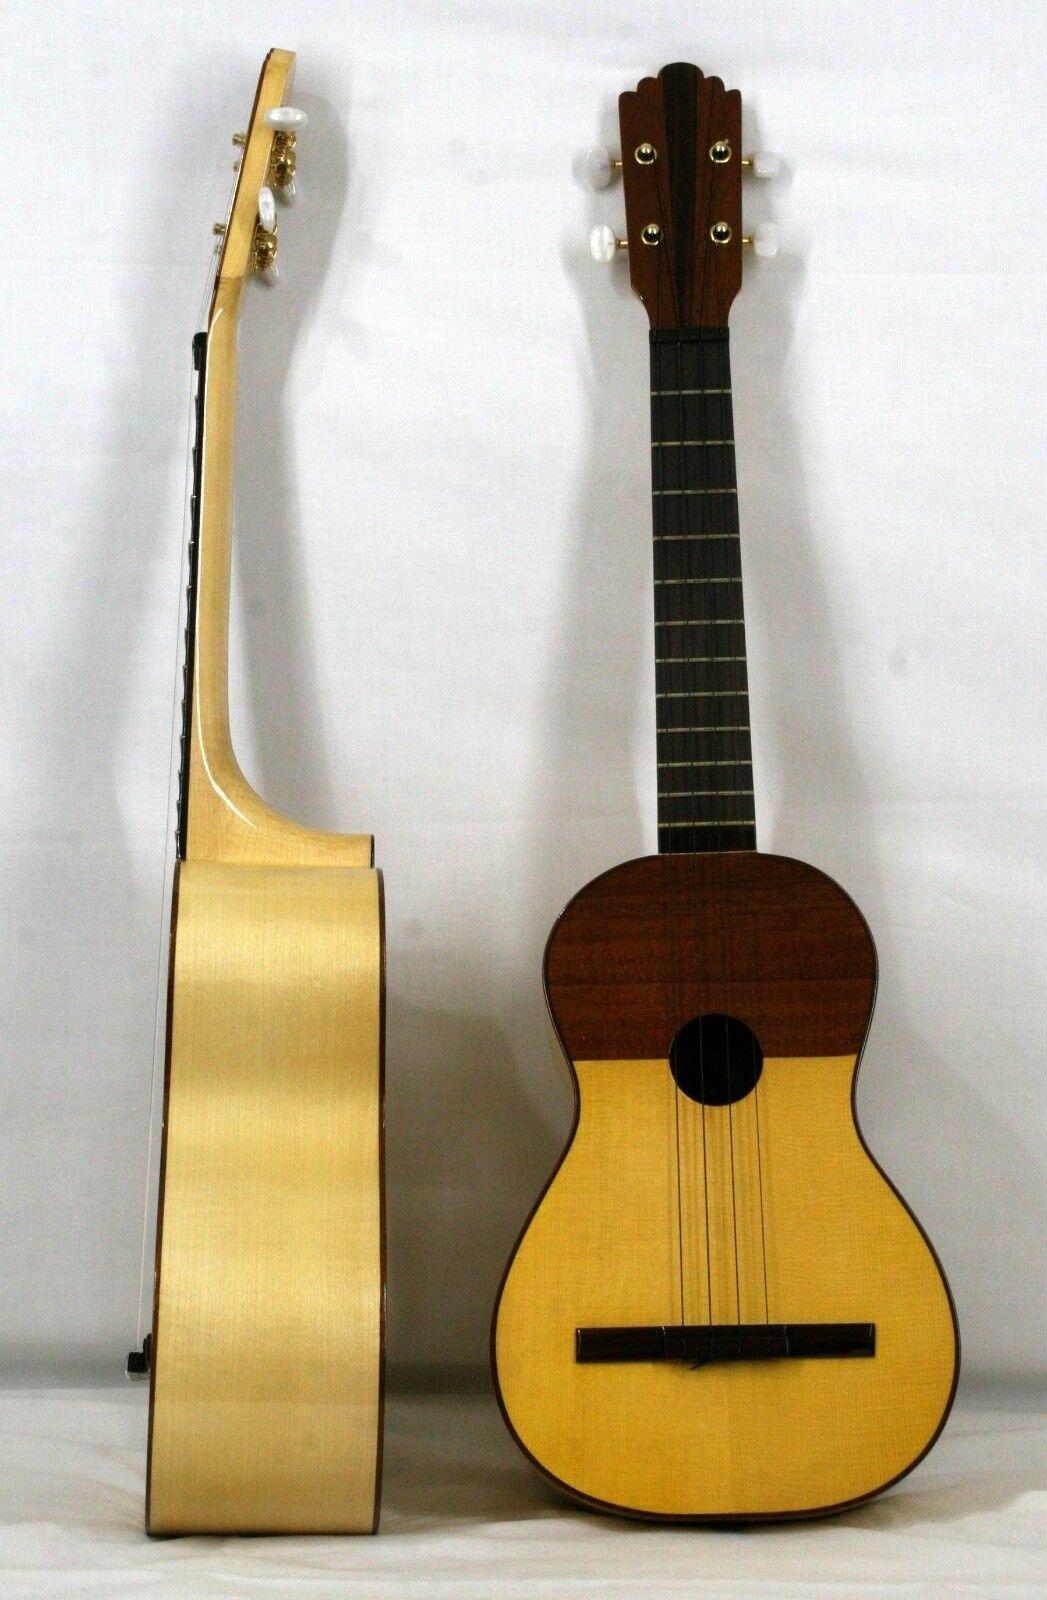 Musikalia Cuatros Venezuelano in con acero con in tavola armonica in abete perfilata 555106